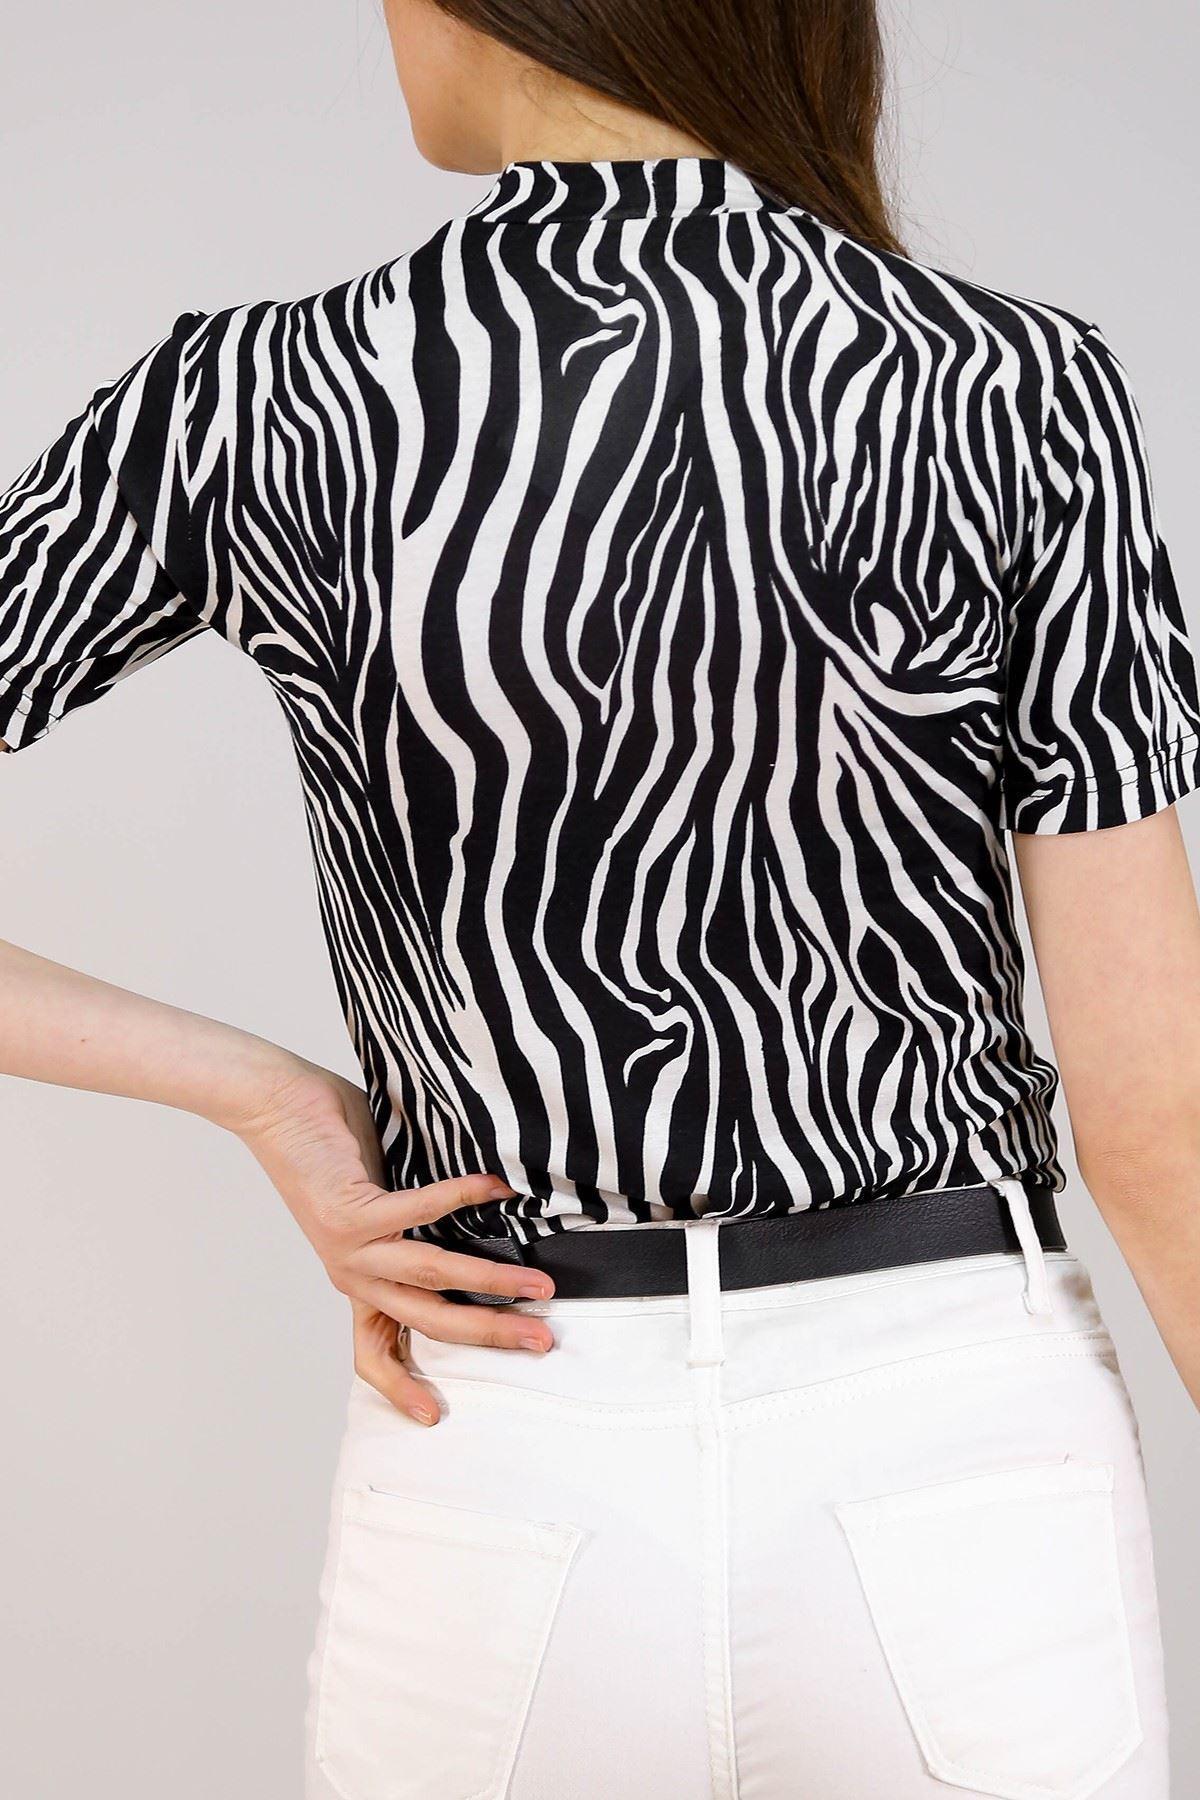 Desenli Body Zebra - 5292.1286.